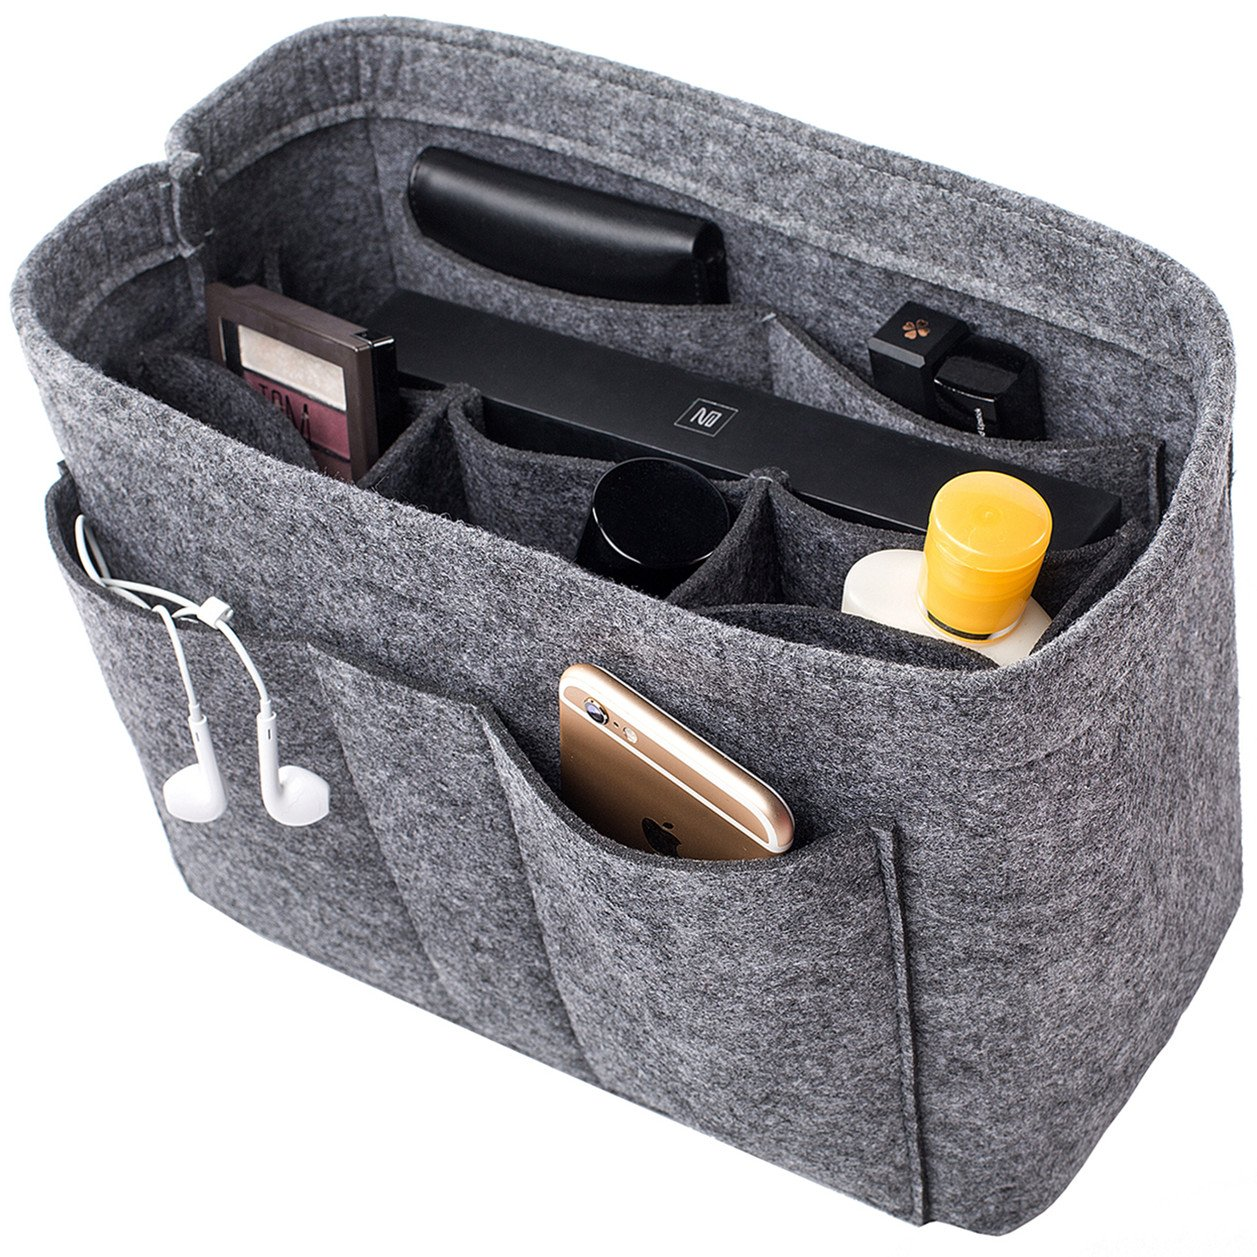 Felt Insert Bag Organizer Purse Organizer, Handbag Bag in Bag for Speedy Neverful Longchamp, 3 Sizes